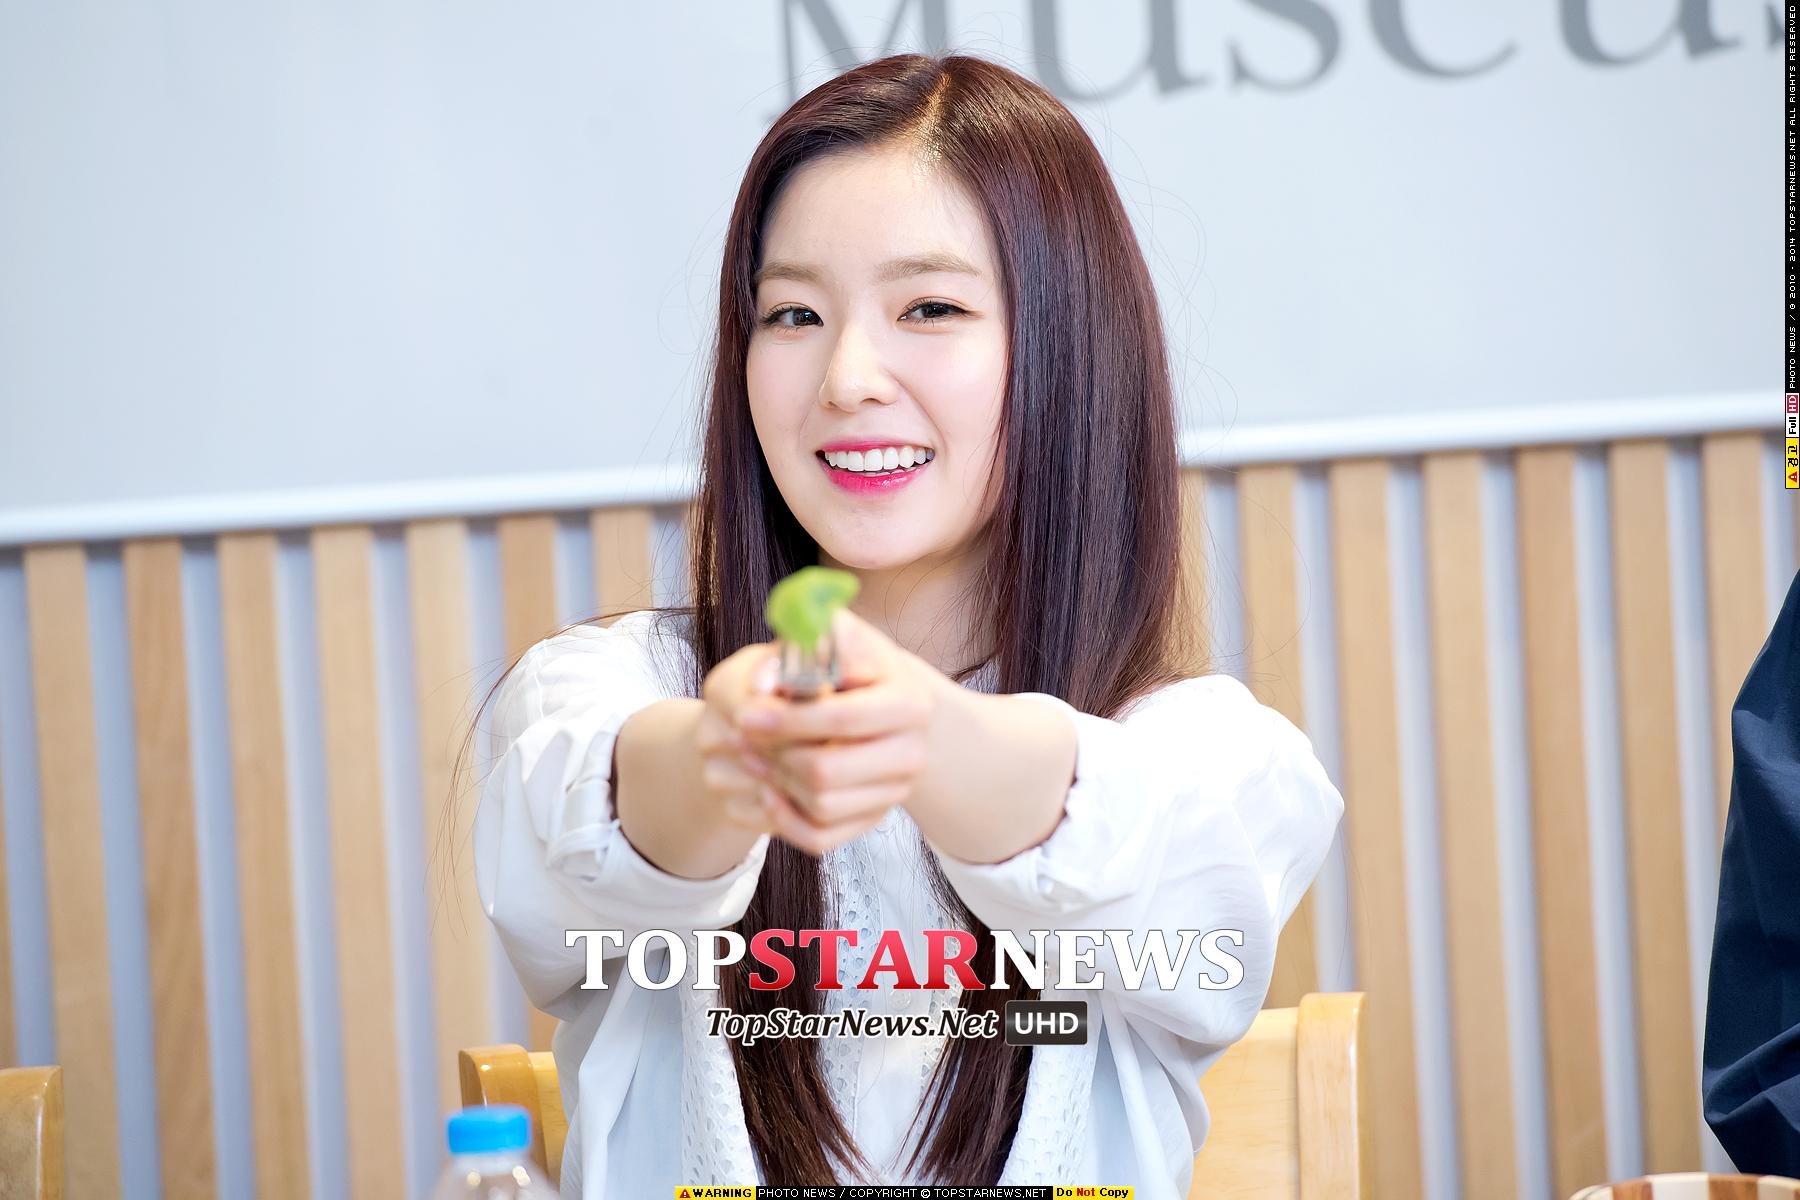 No. 8 Red Velvet Irene 得票率4.2% 少女時代的師妹團體Red Velvet最近人氣直線上升,其中隊長Irene的優質外貌也被注意到~打敗許多美女奪下第8